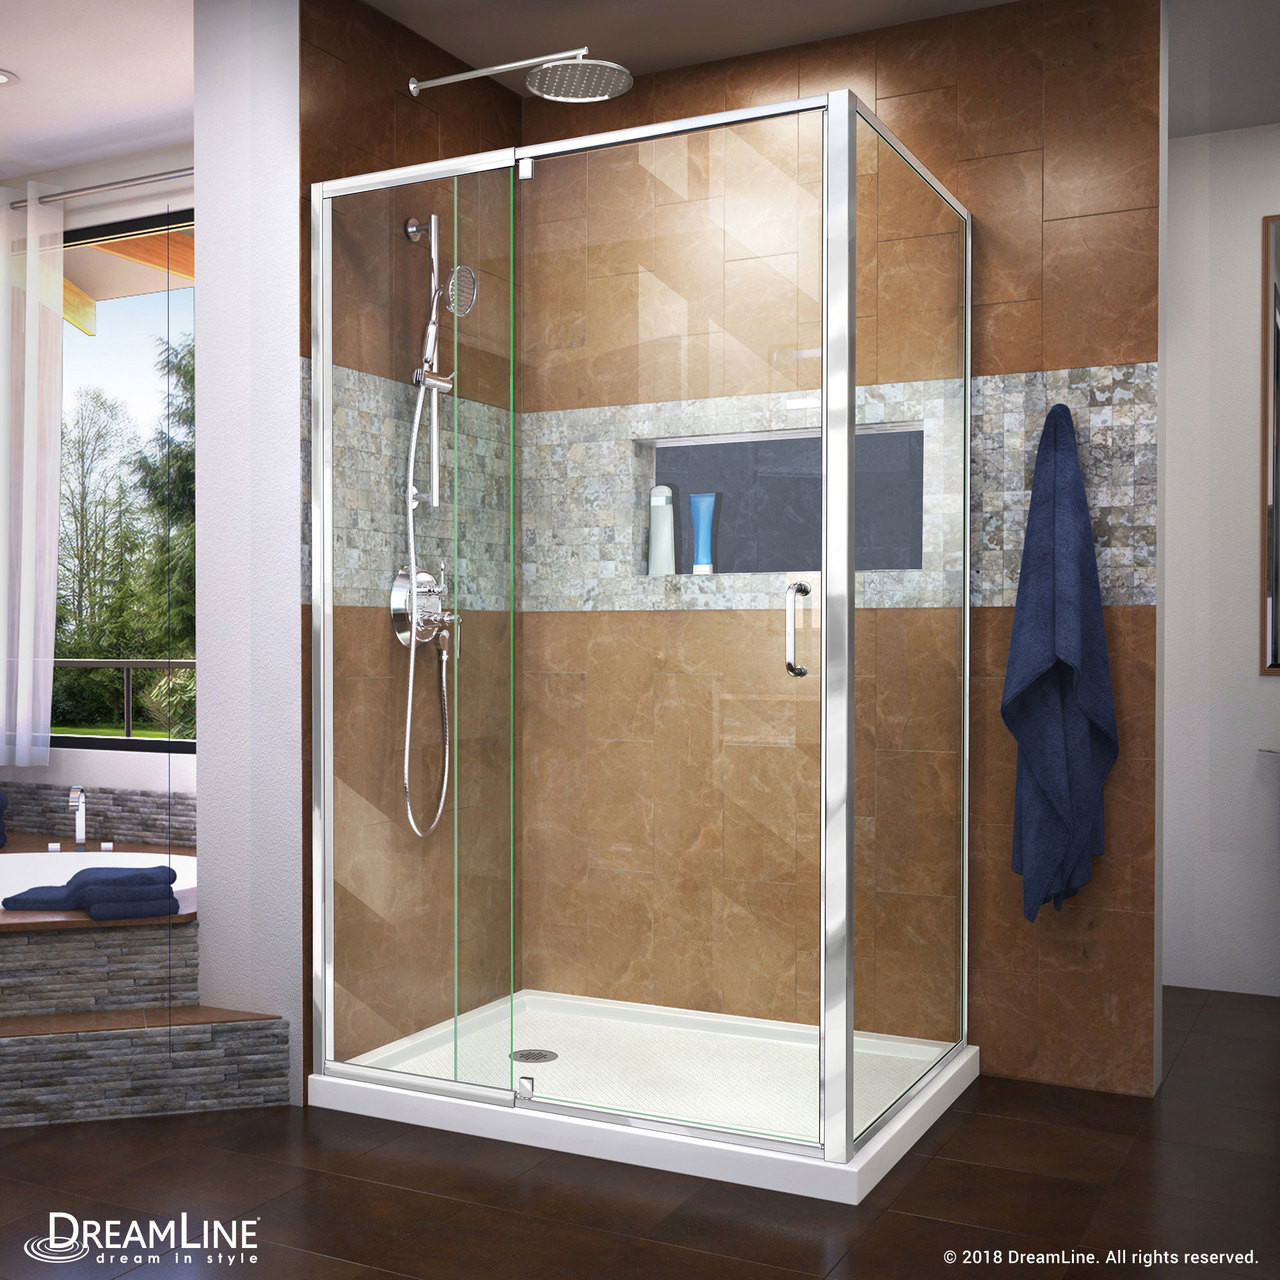 Dreamline Dl 6719l 01cl Flex 36 In D X 48 In W X 74 3 4 In H Semi Frameless Pivot Shower Enclosure In Chrome With Left Drain White Base Kit